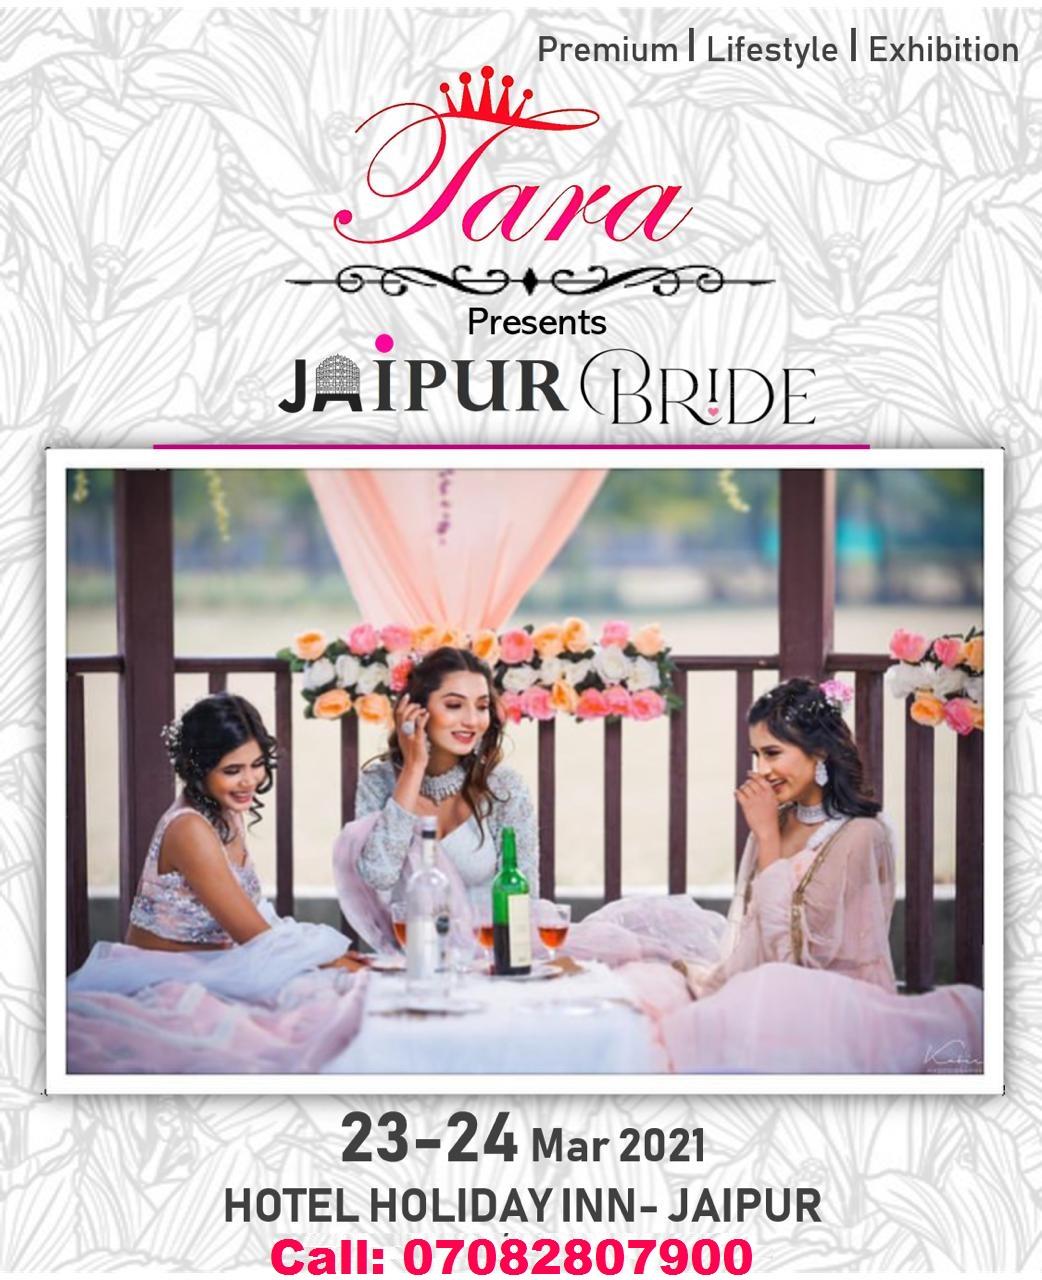 Jaipur Bride